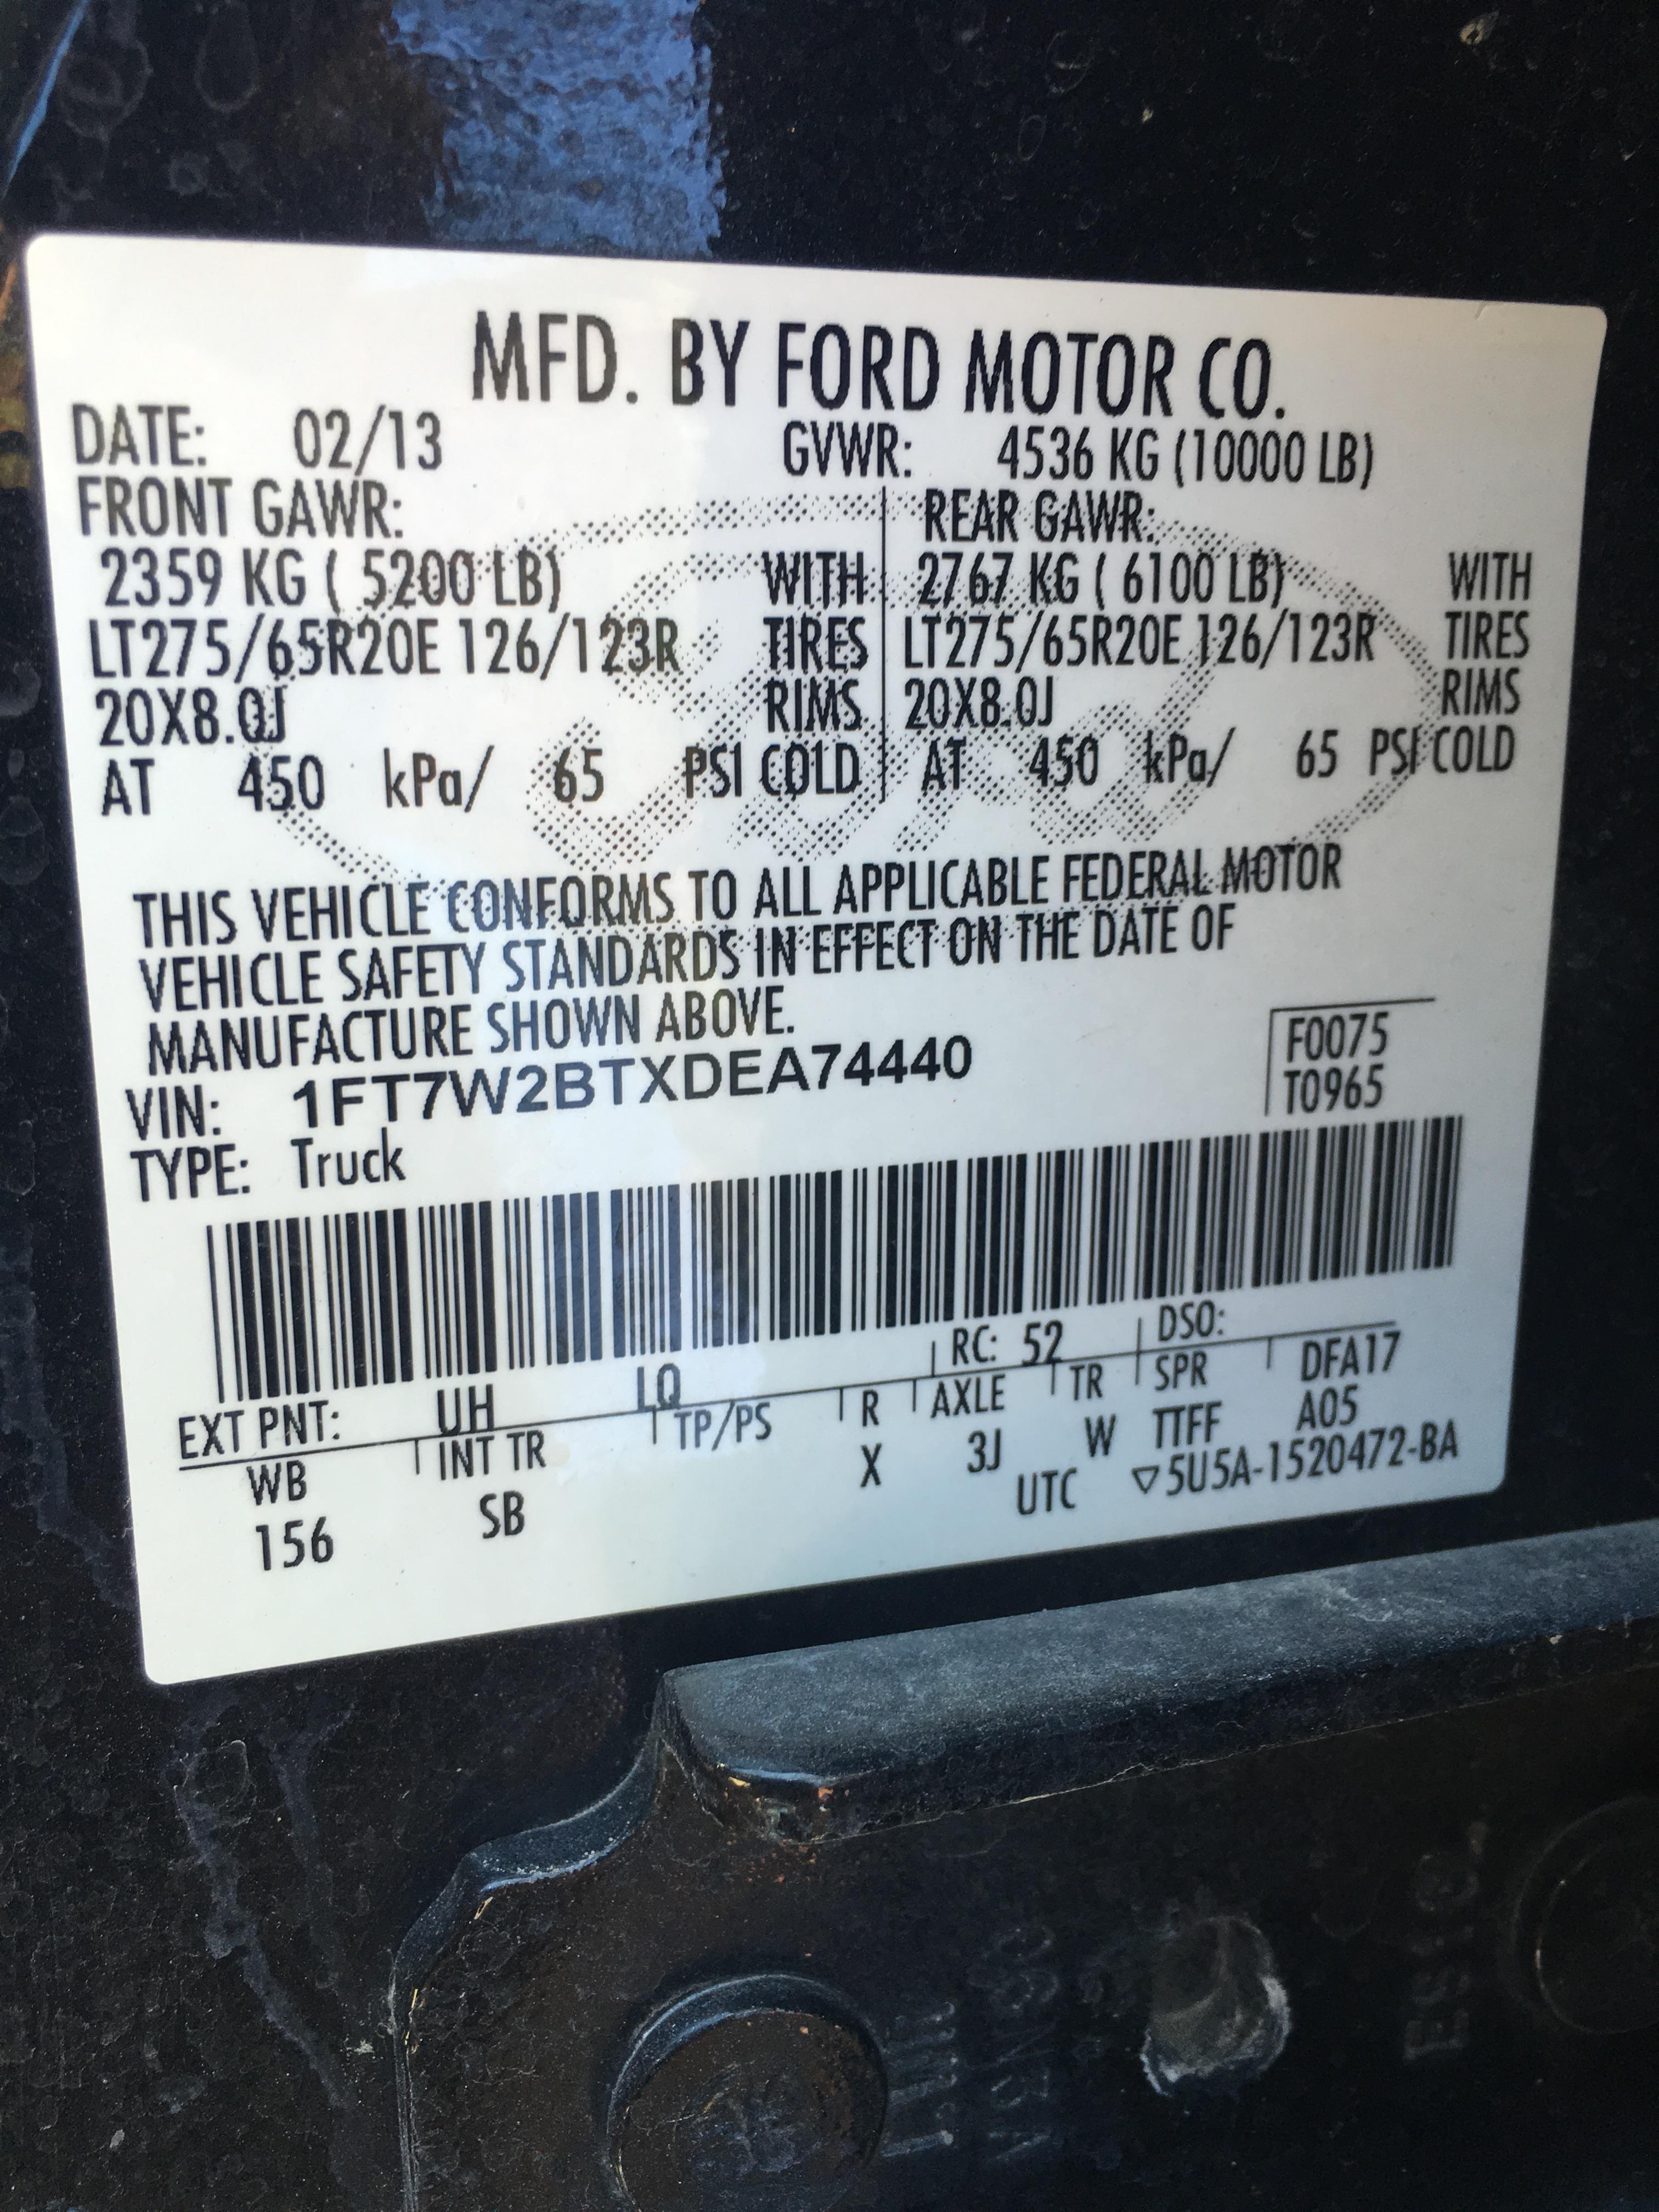 Dodge Ram 1500 Diesel >> How To Find Rear Axle Ratio - Ford Powerstroke Diesel Forum